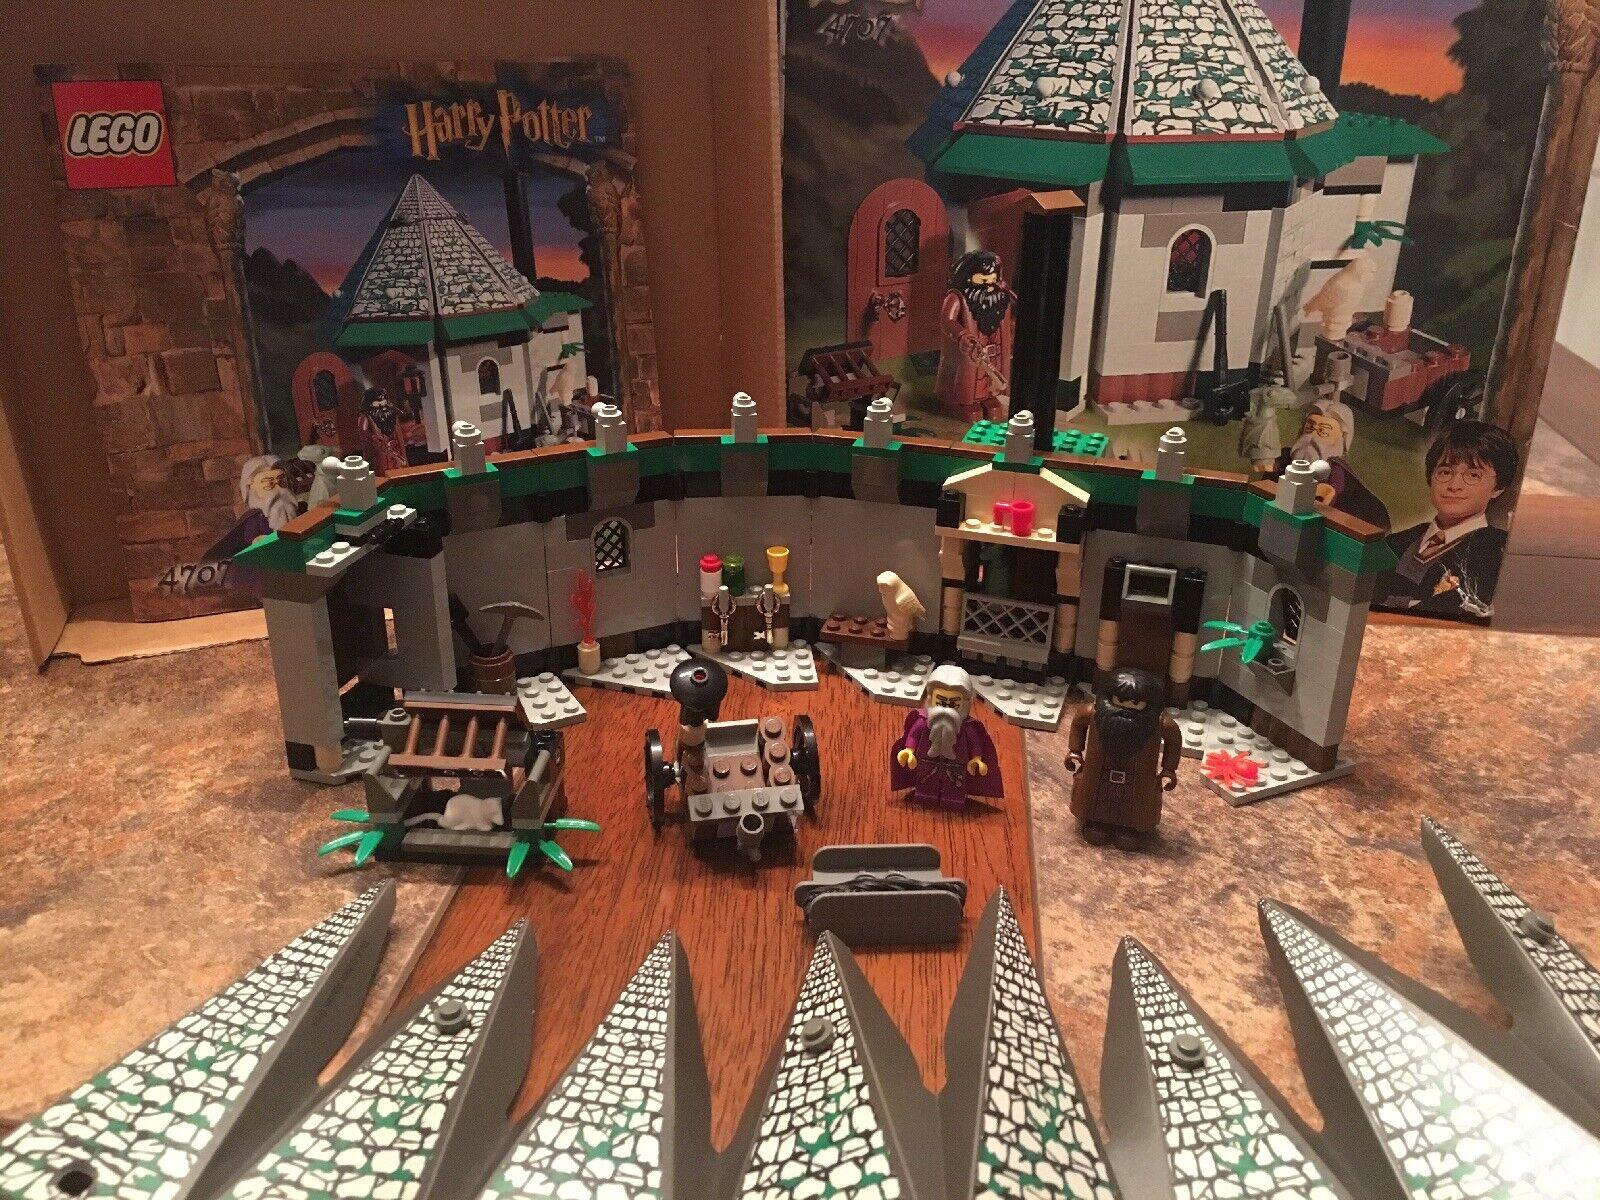 Lego  4707 299  Pieces Harry Potter Hagrid's Hut completare With uomoual & scatola  negozio a basso costo